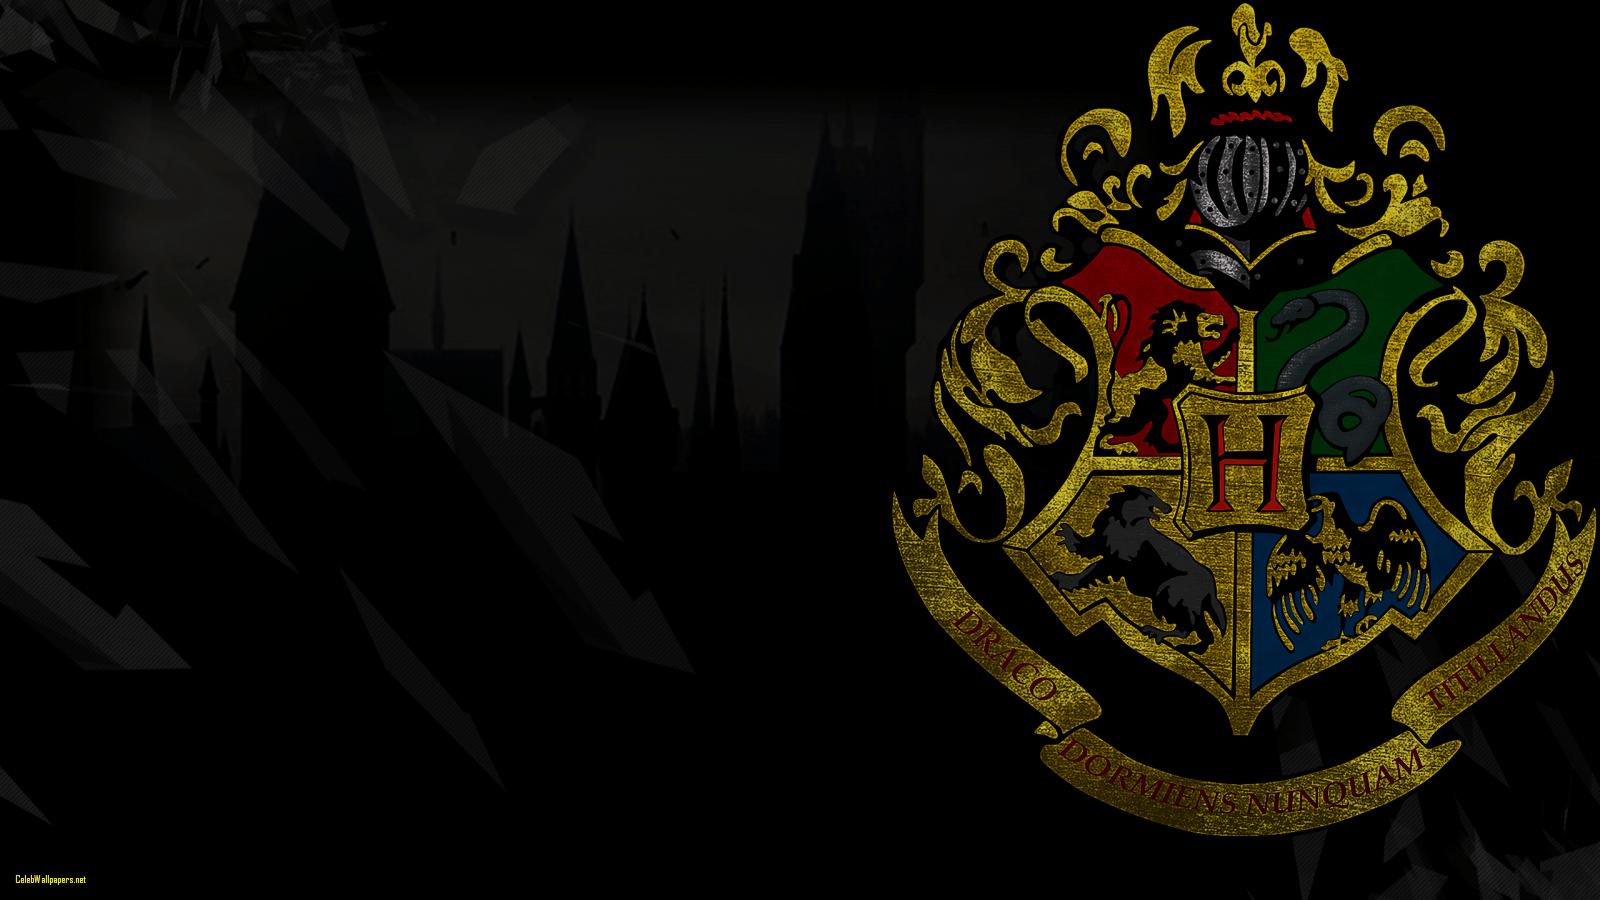 1600x900 Harry Potter Wallpaper Hd Harry Potter Hd